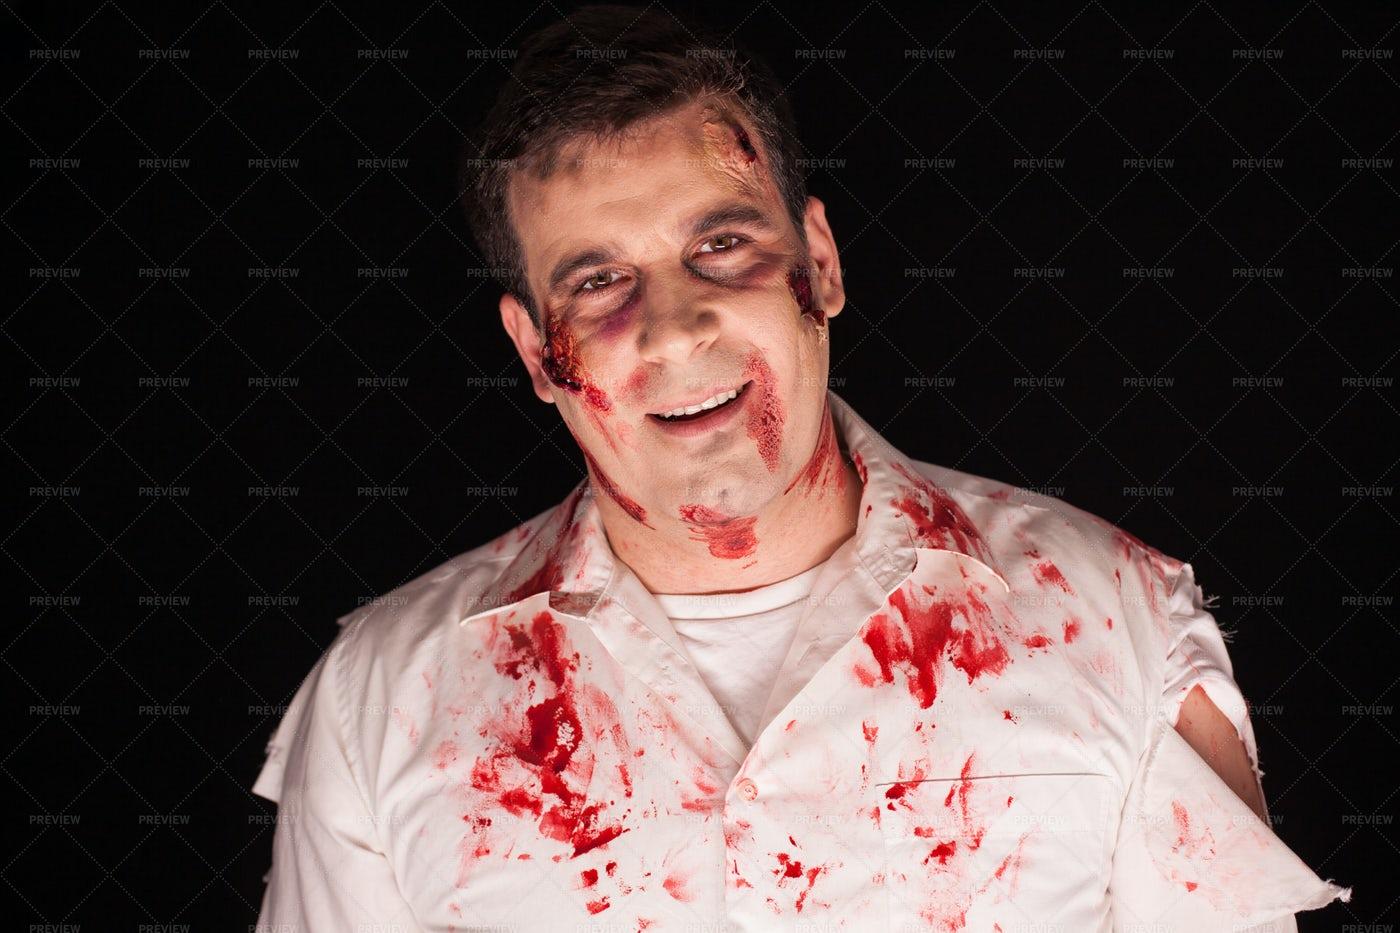 Face Of Creepy Zombie: Stock Photos